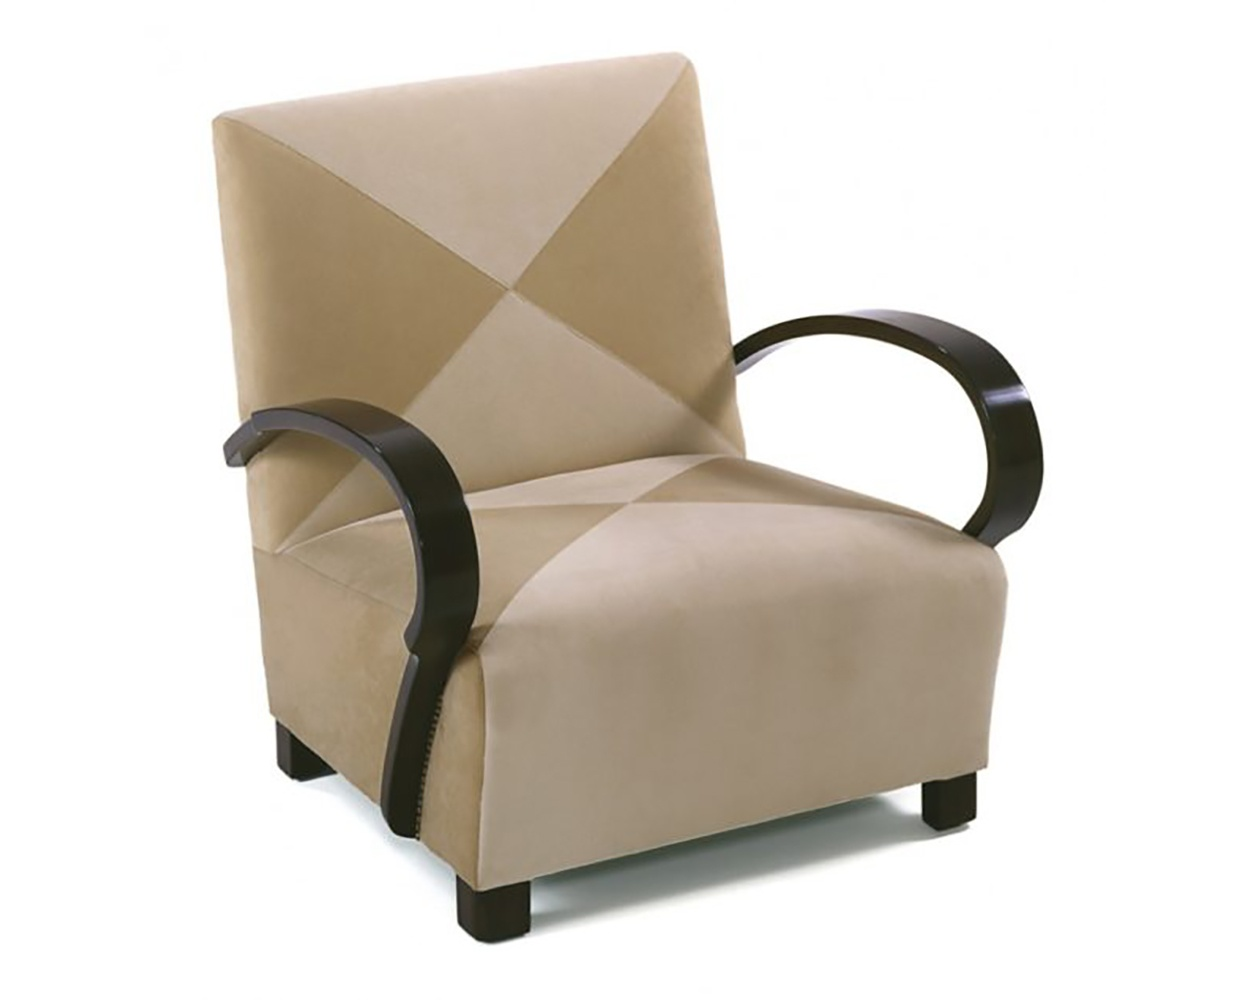 2129-Steamer-Lounge-795×826-1-610×634